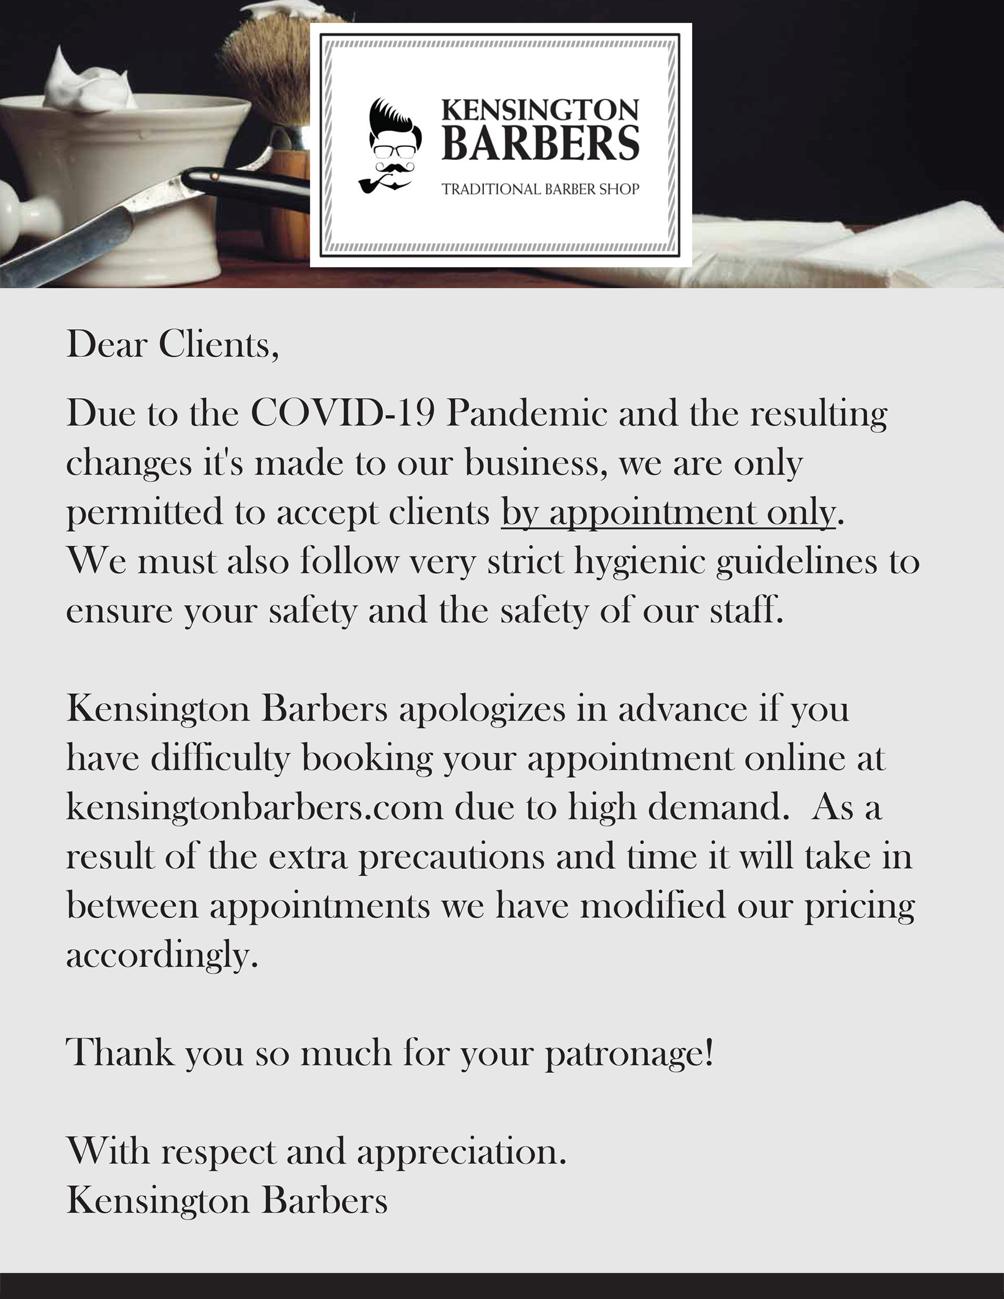 Dear Clients